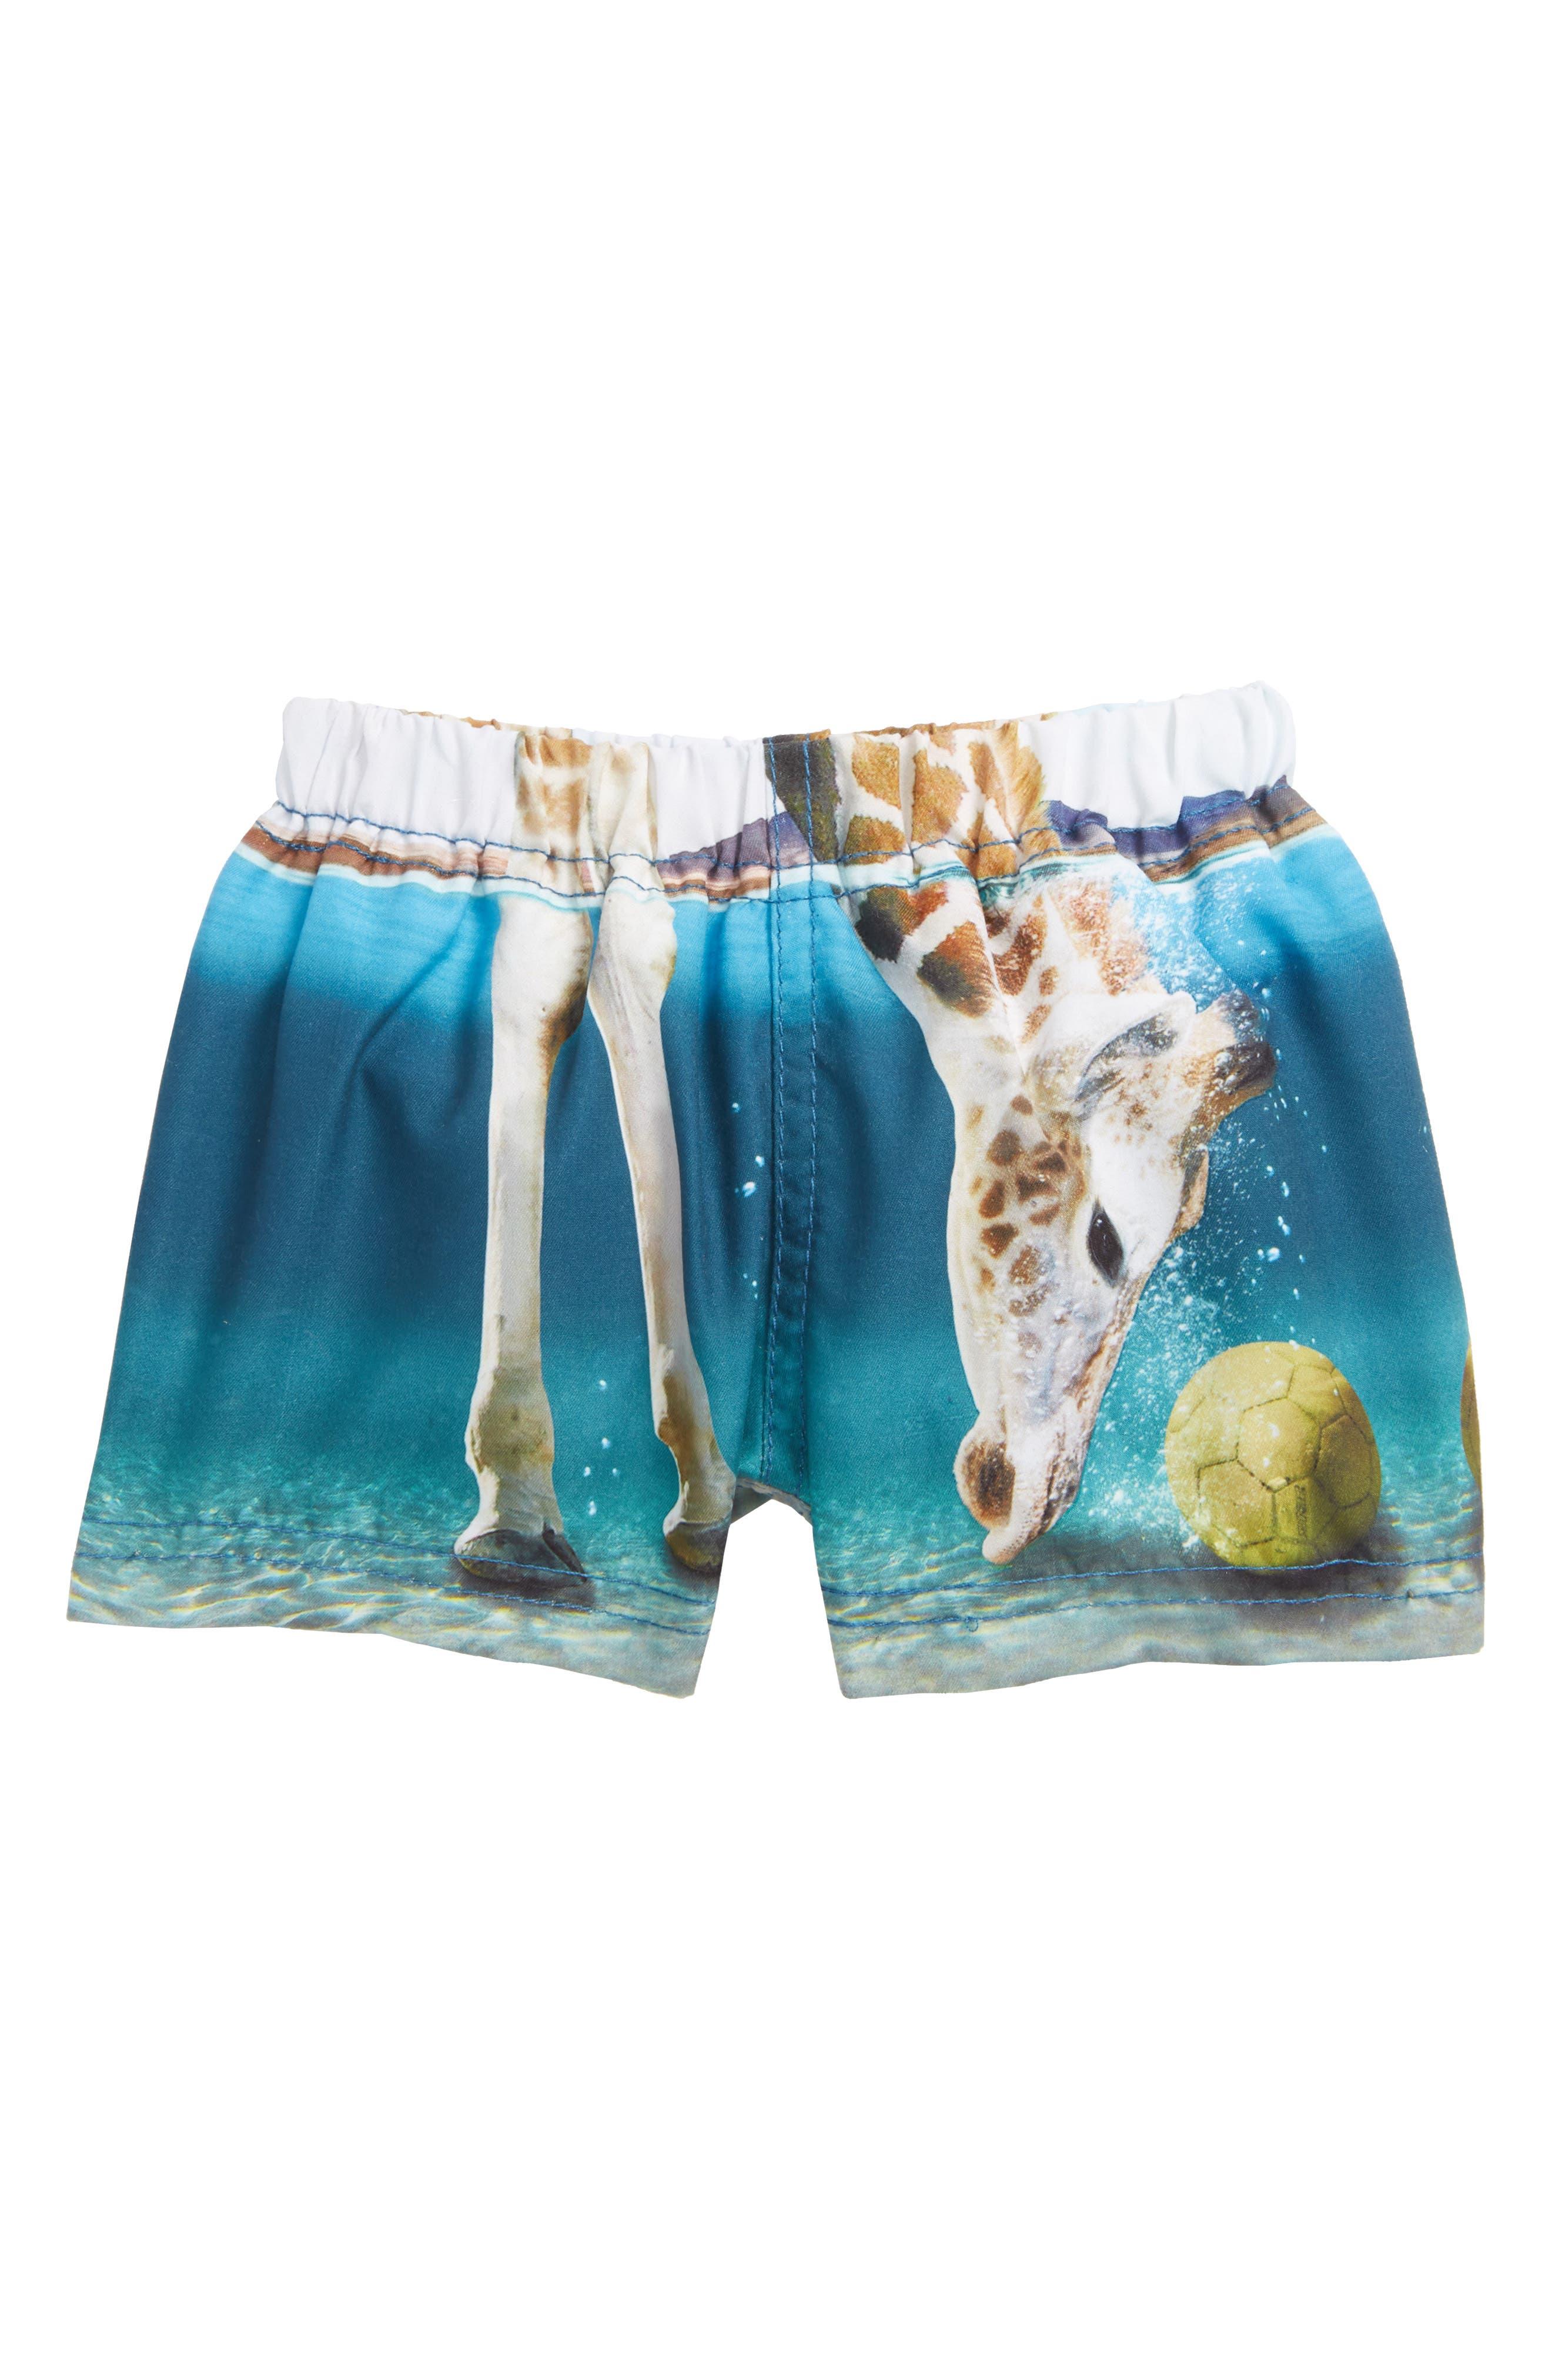 Newton Swim Trunks,                         Main,                         color, Giraffe